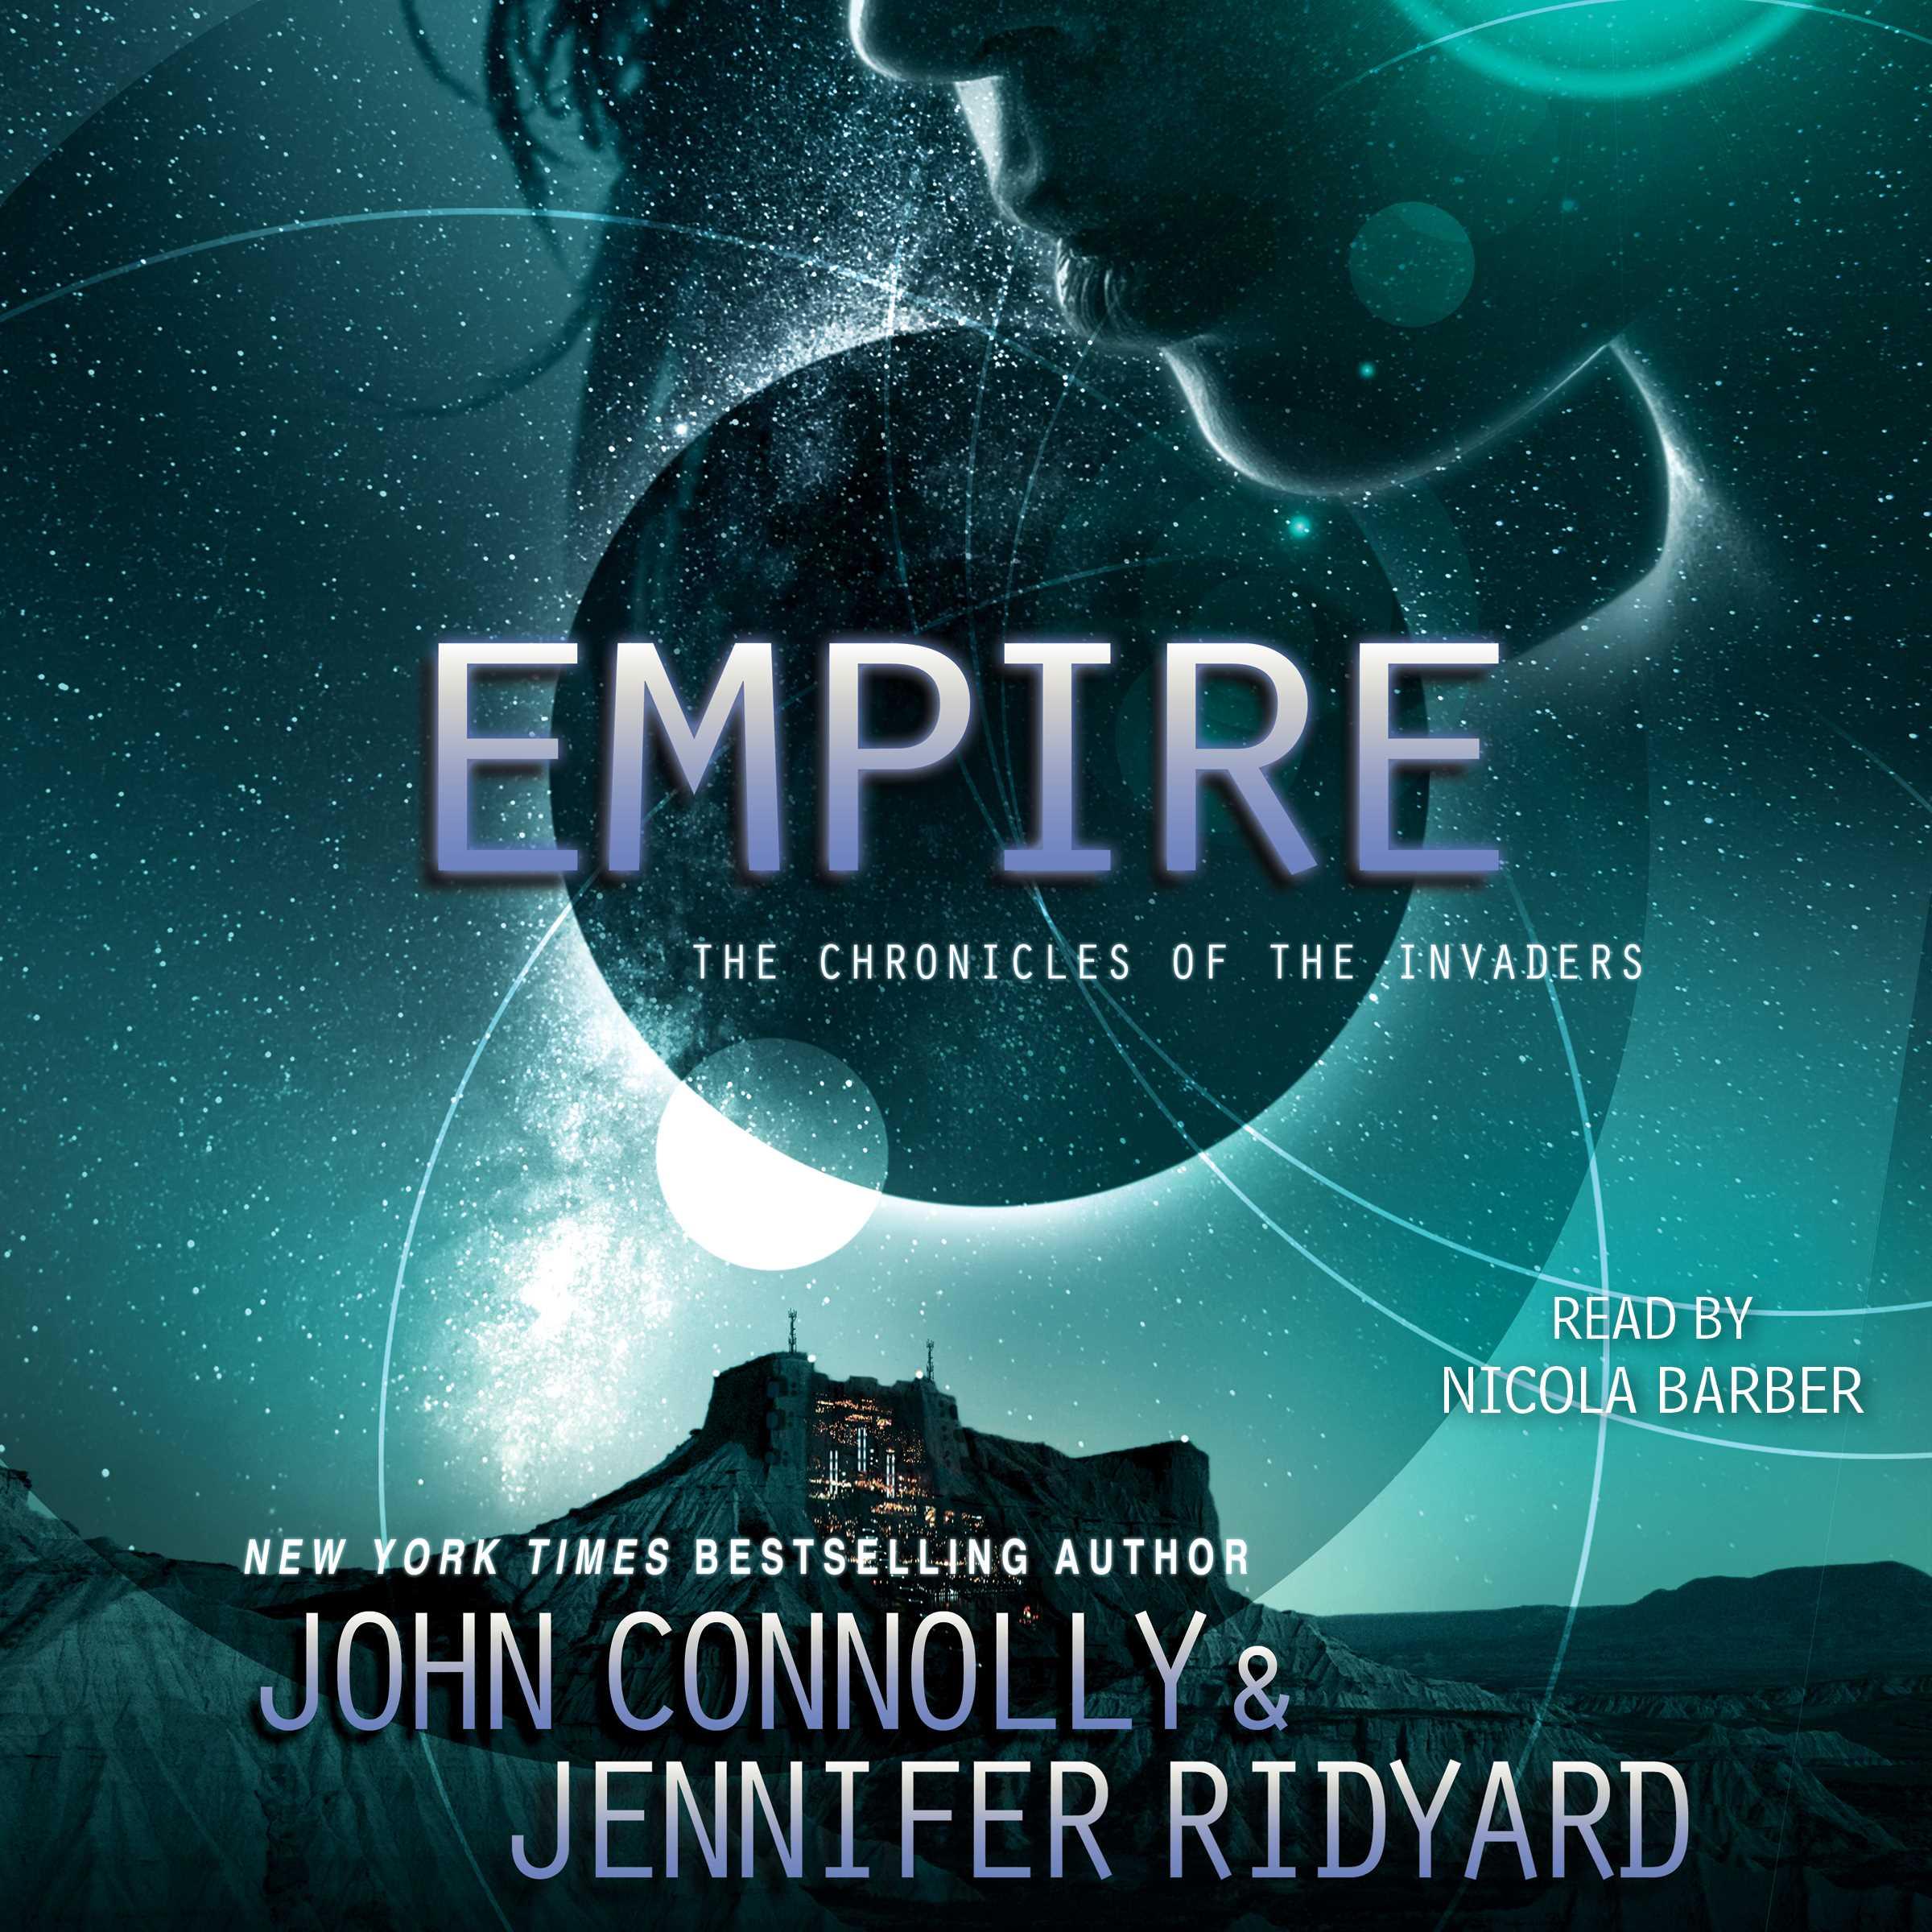 Empire 9781442376540 hr